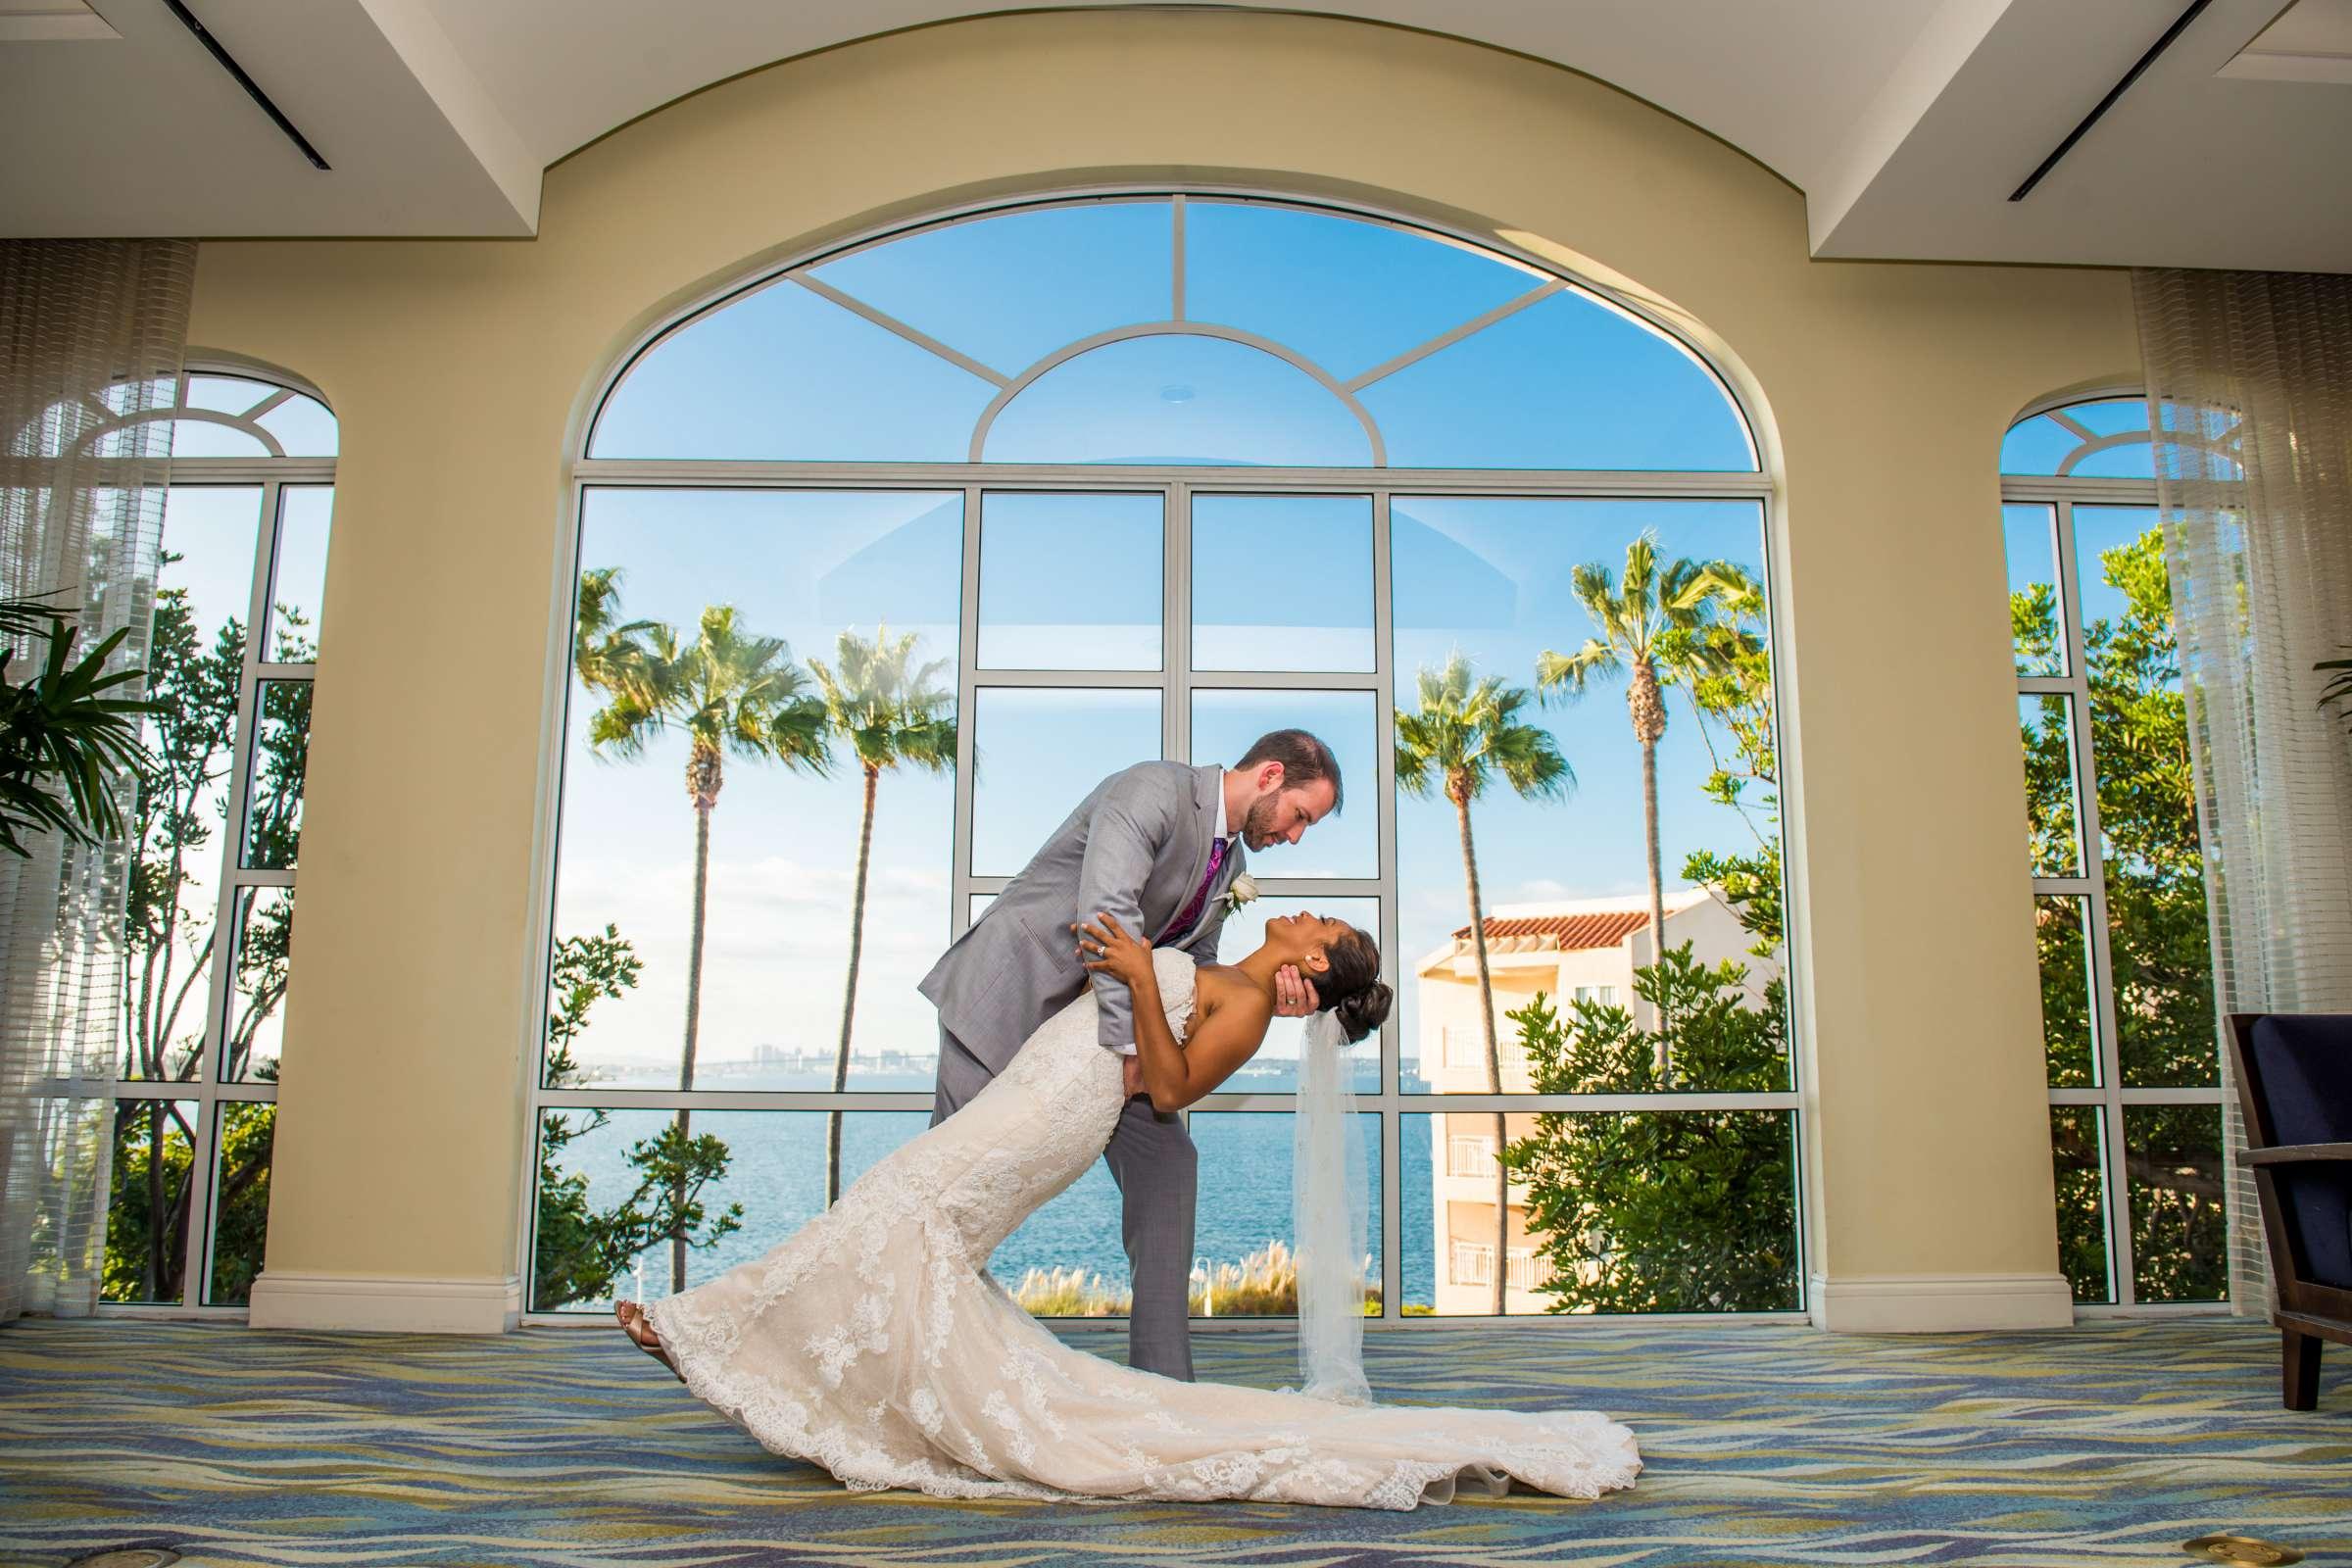 Hijschen and Robert | San Diego Photographer - True Photography